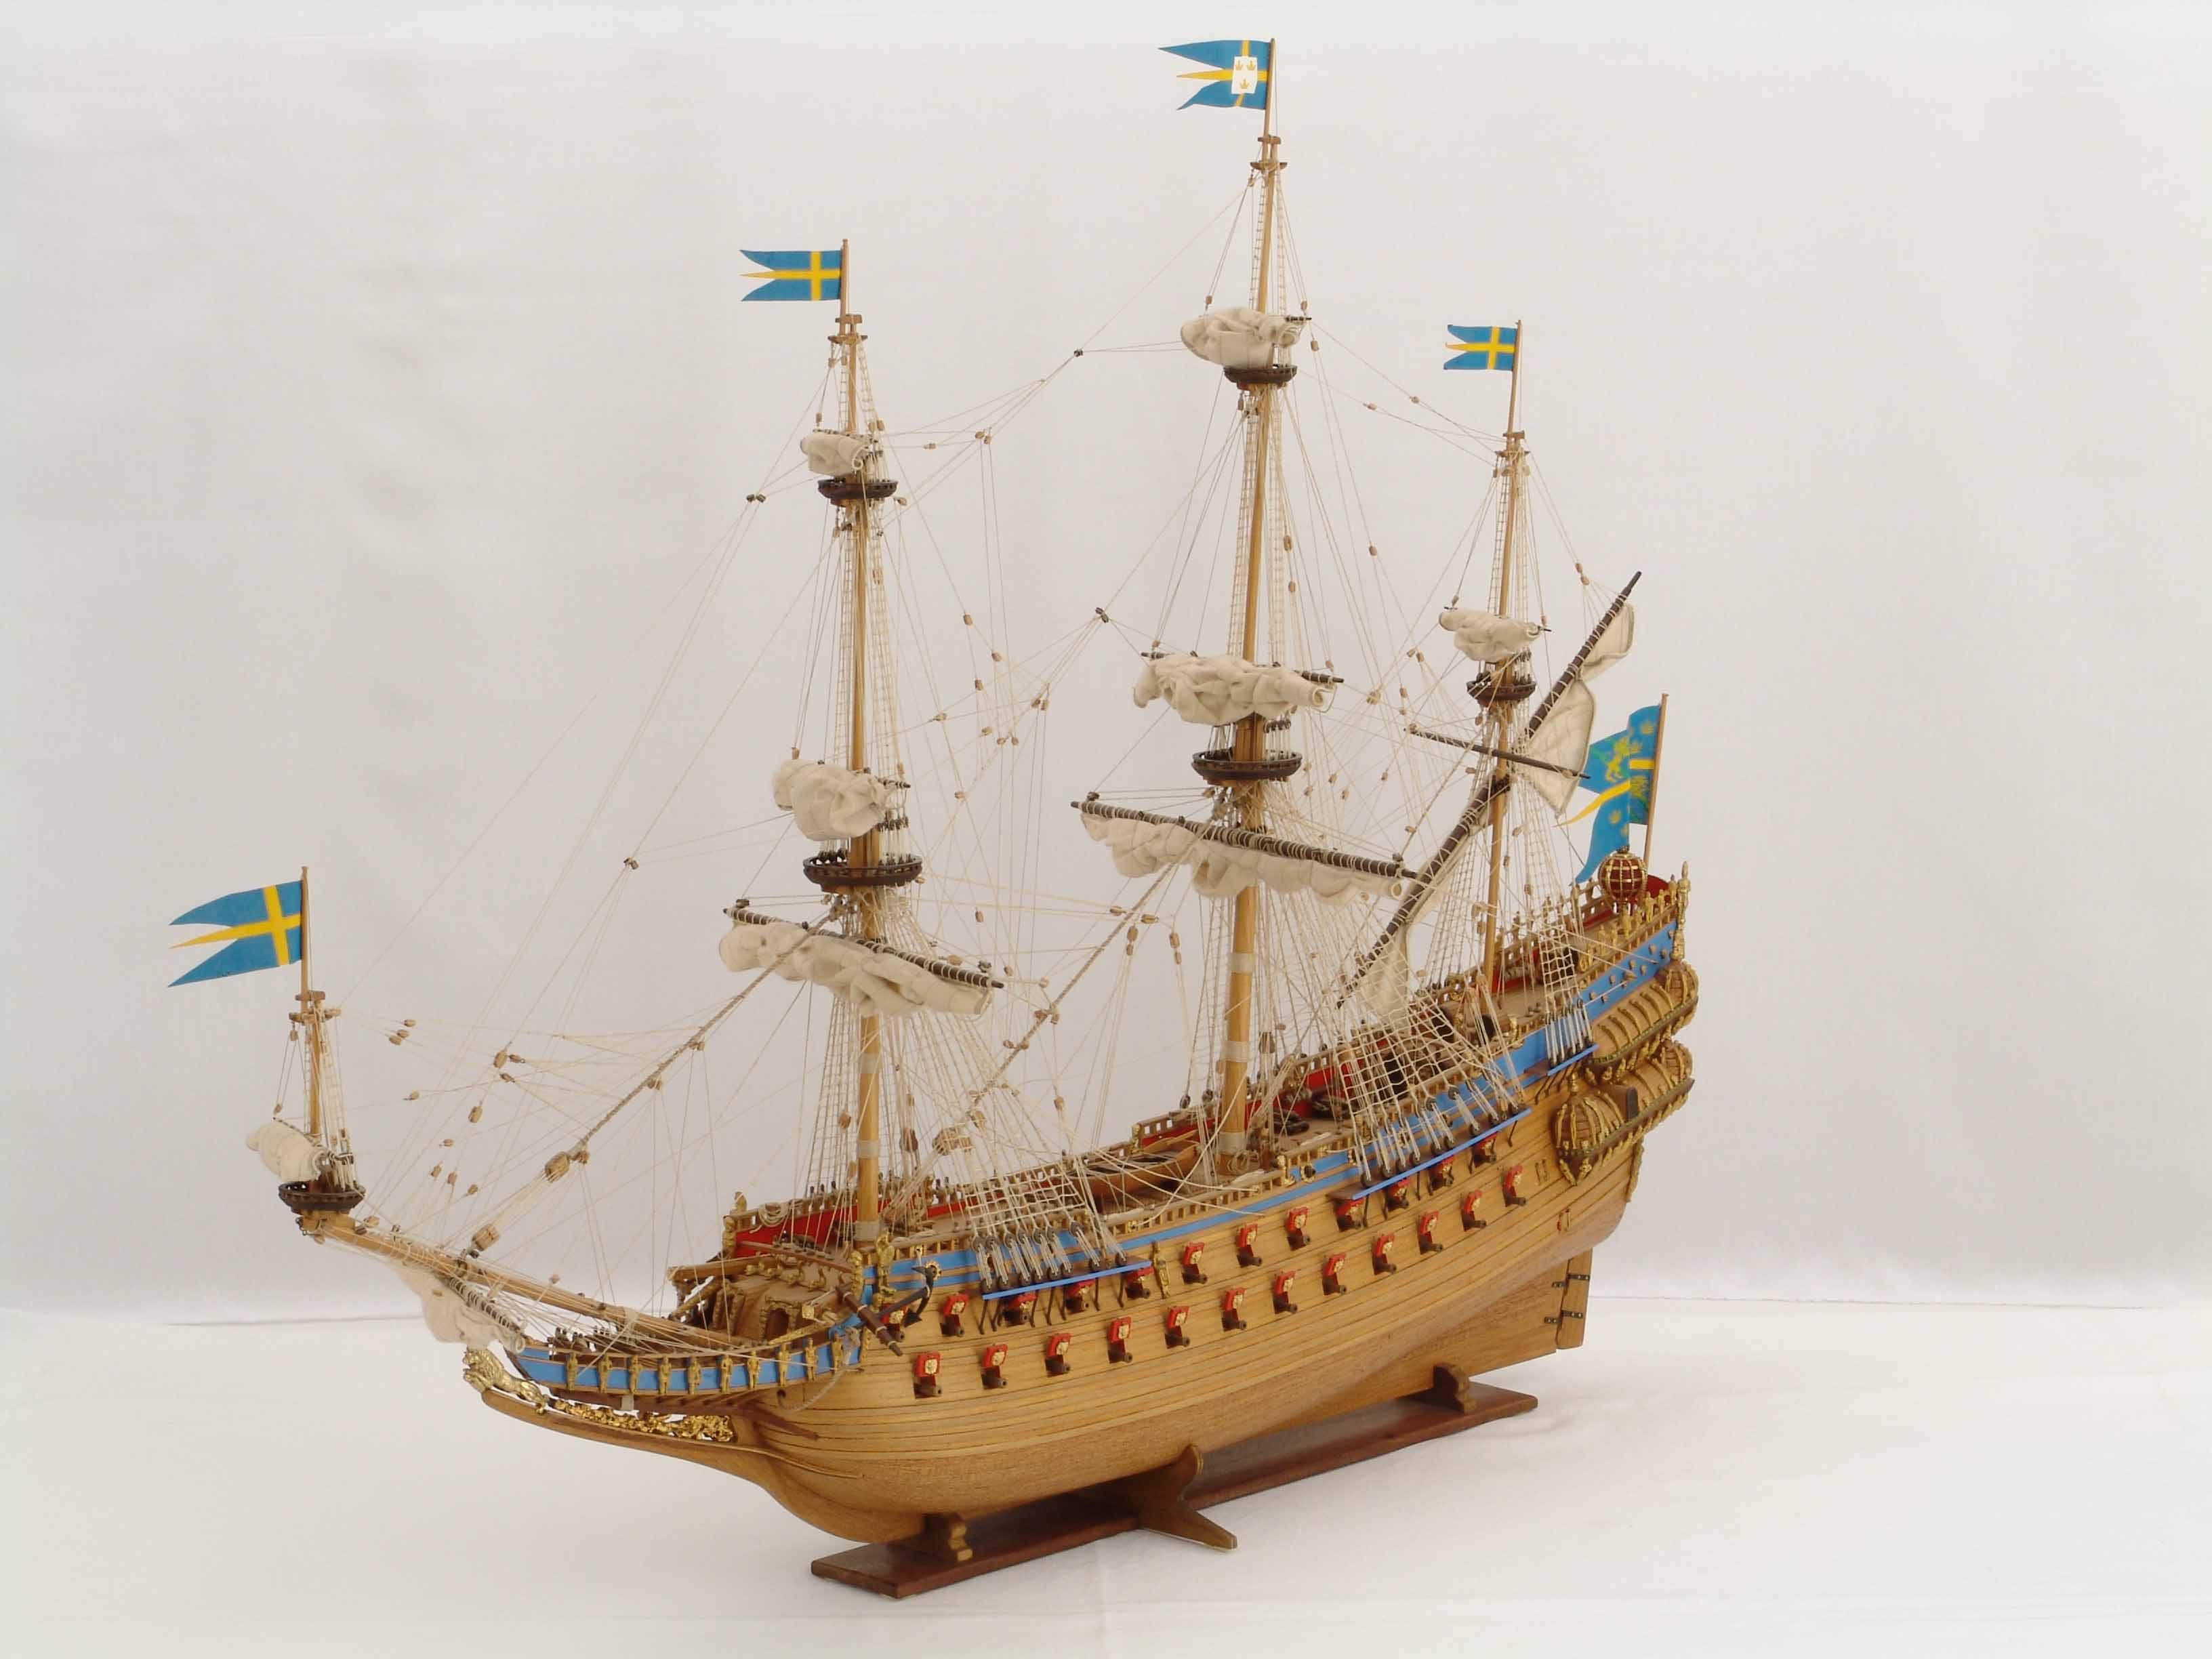 Photos vasa of 1628 ship model for Vasa ship